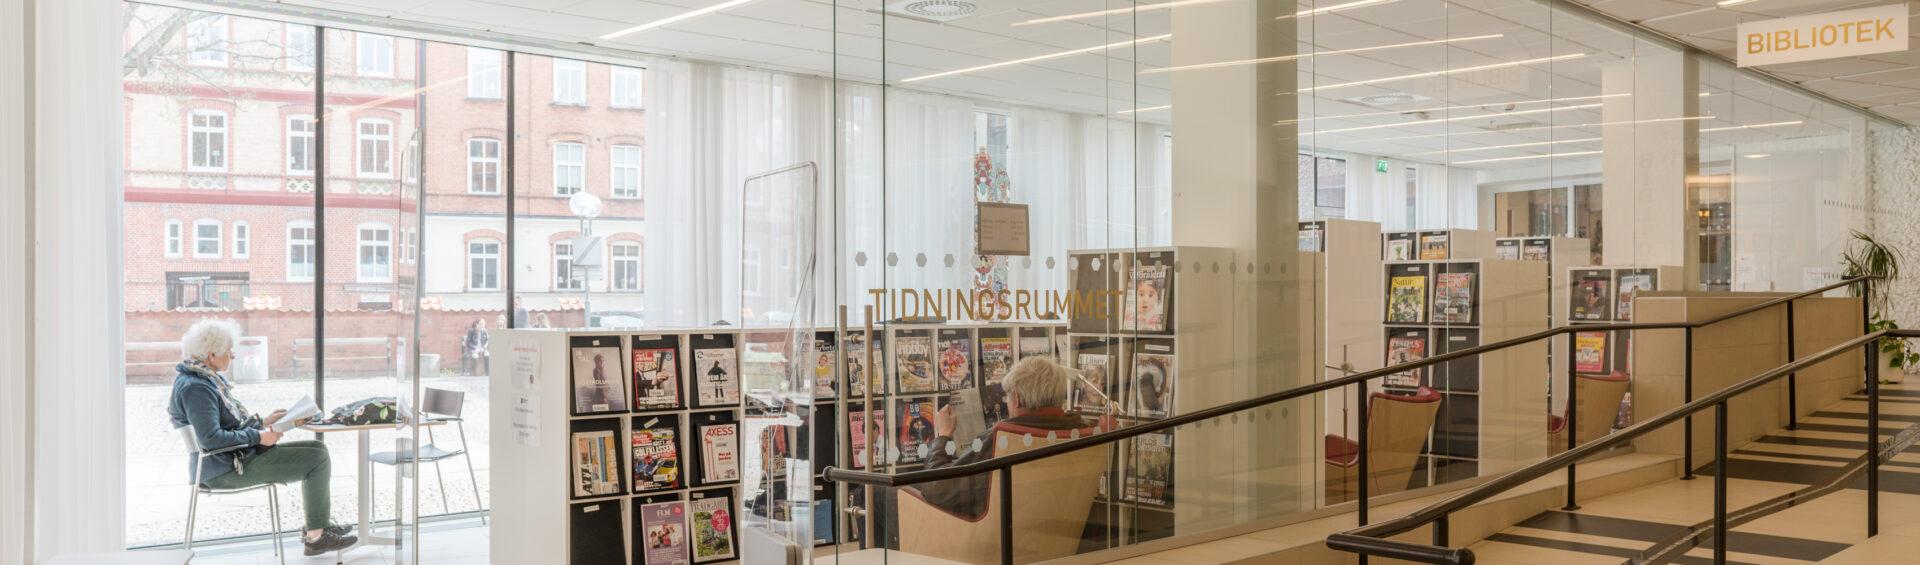 Kristianstads Stadsbiblioteks tidningsrum